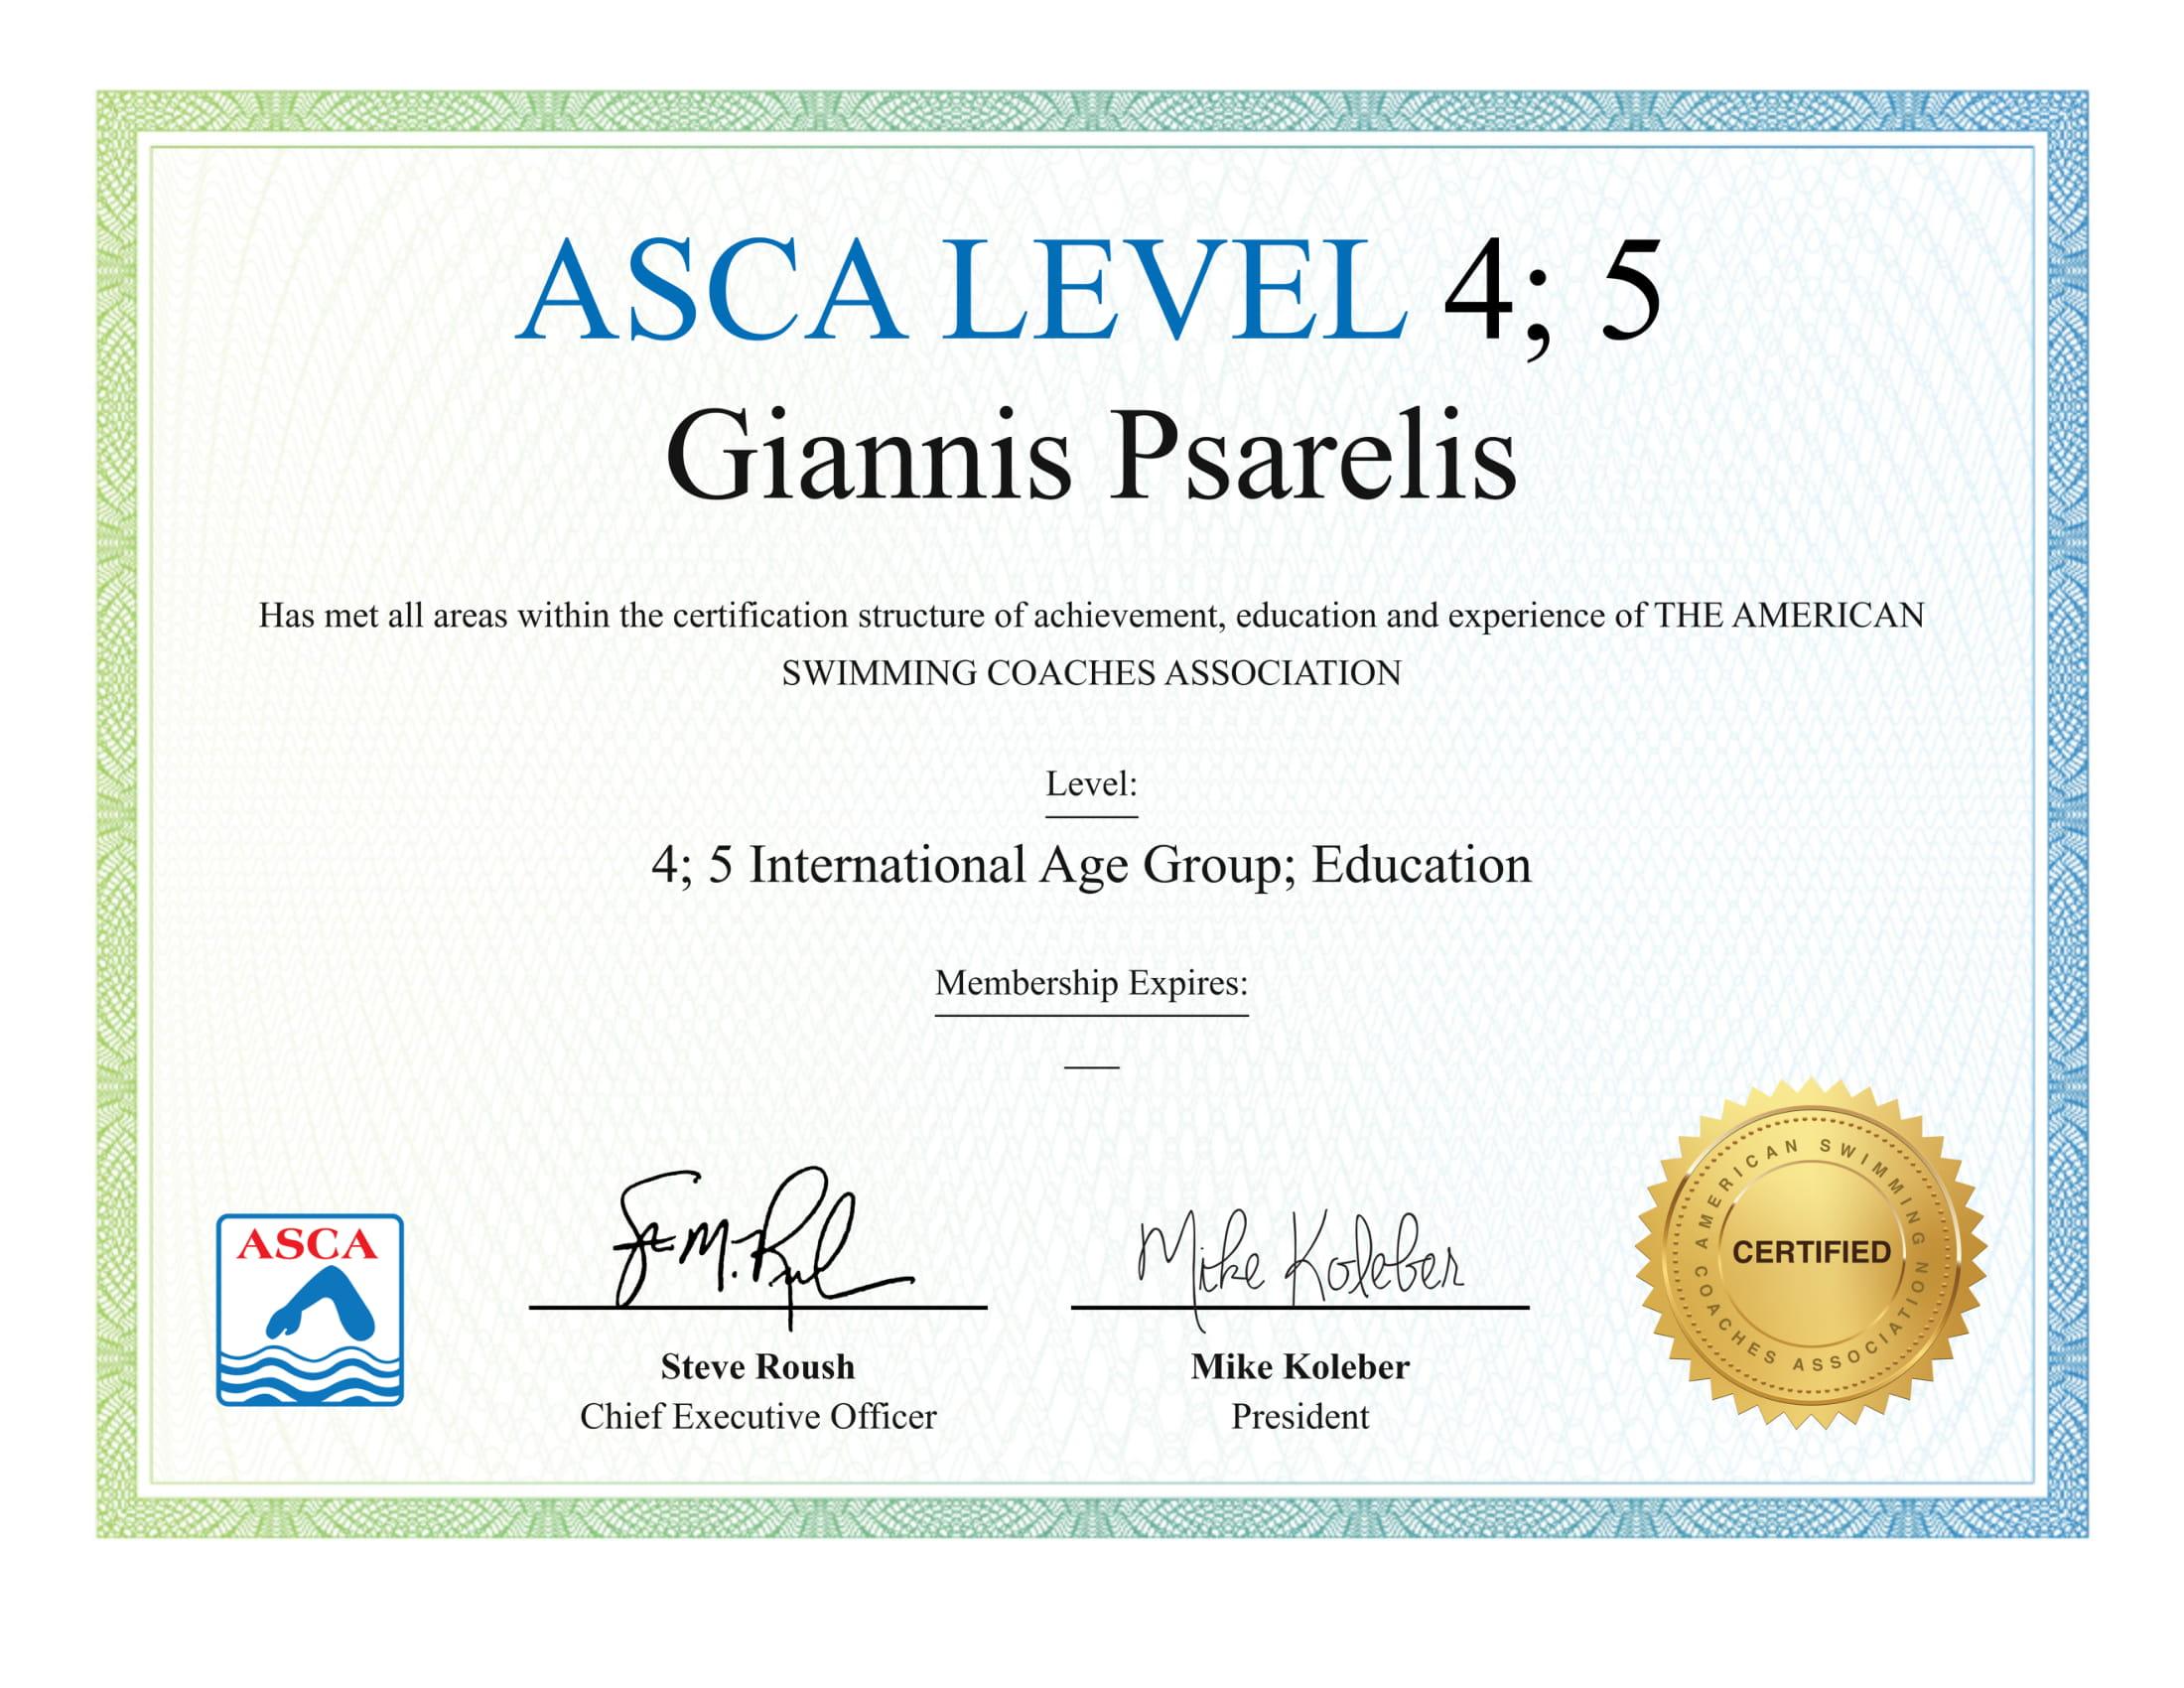 ASCA Certification